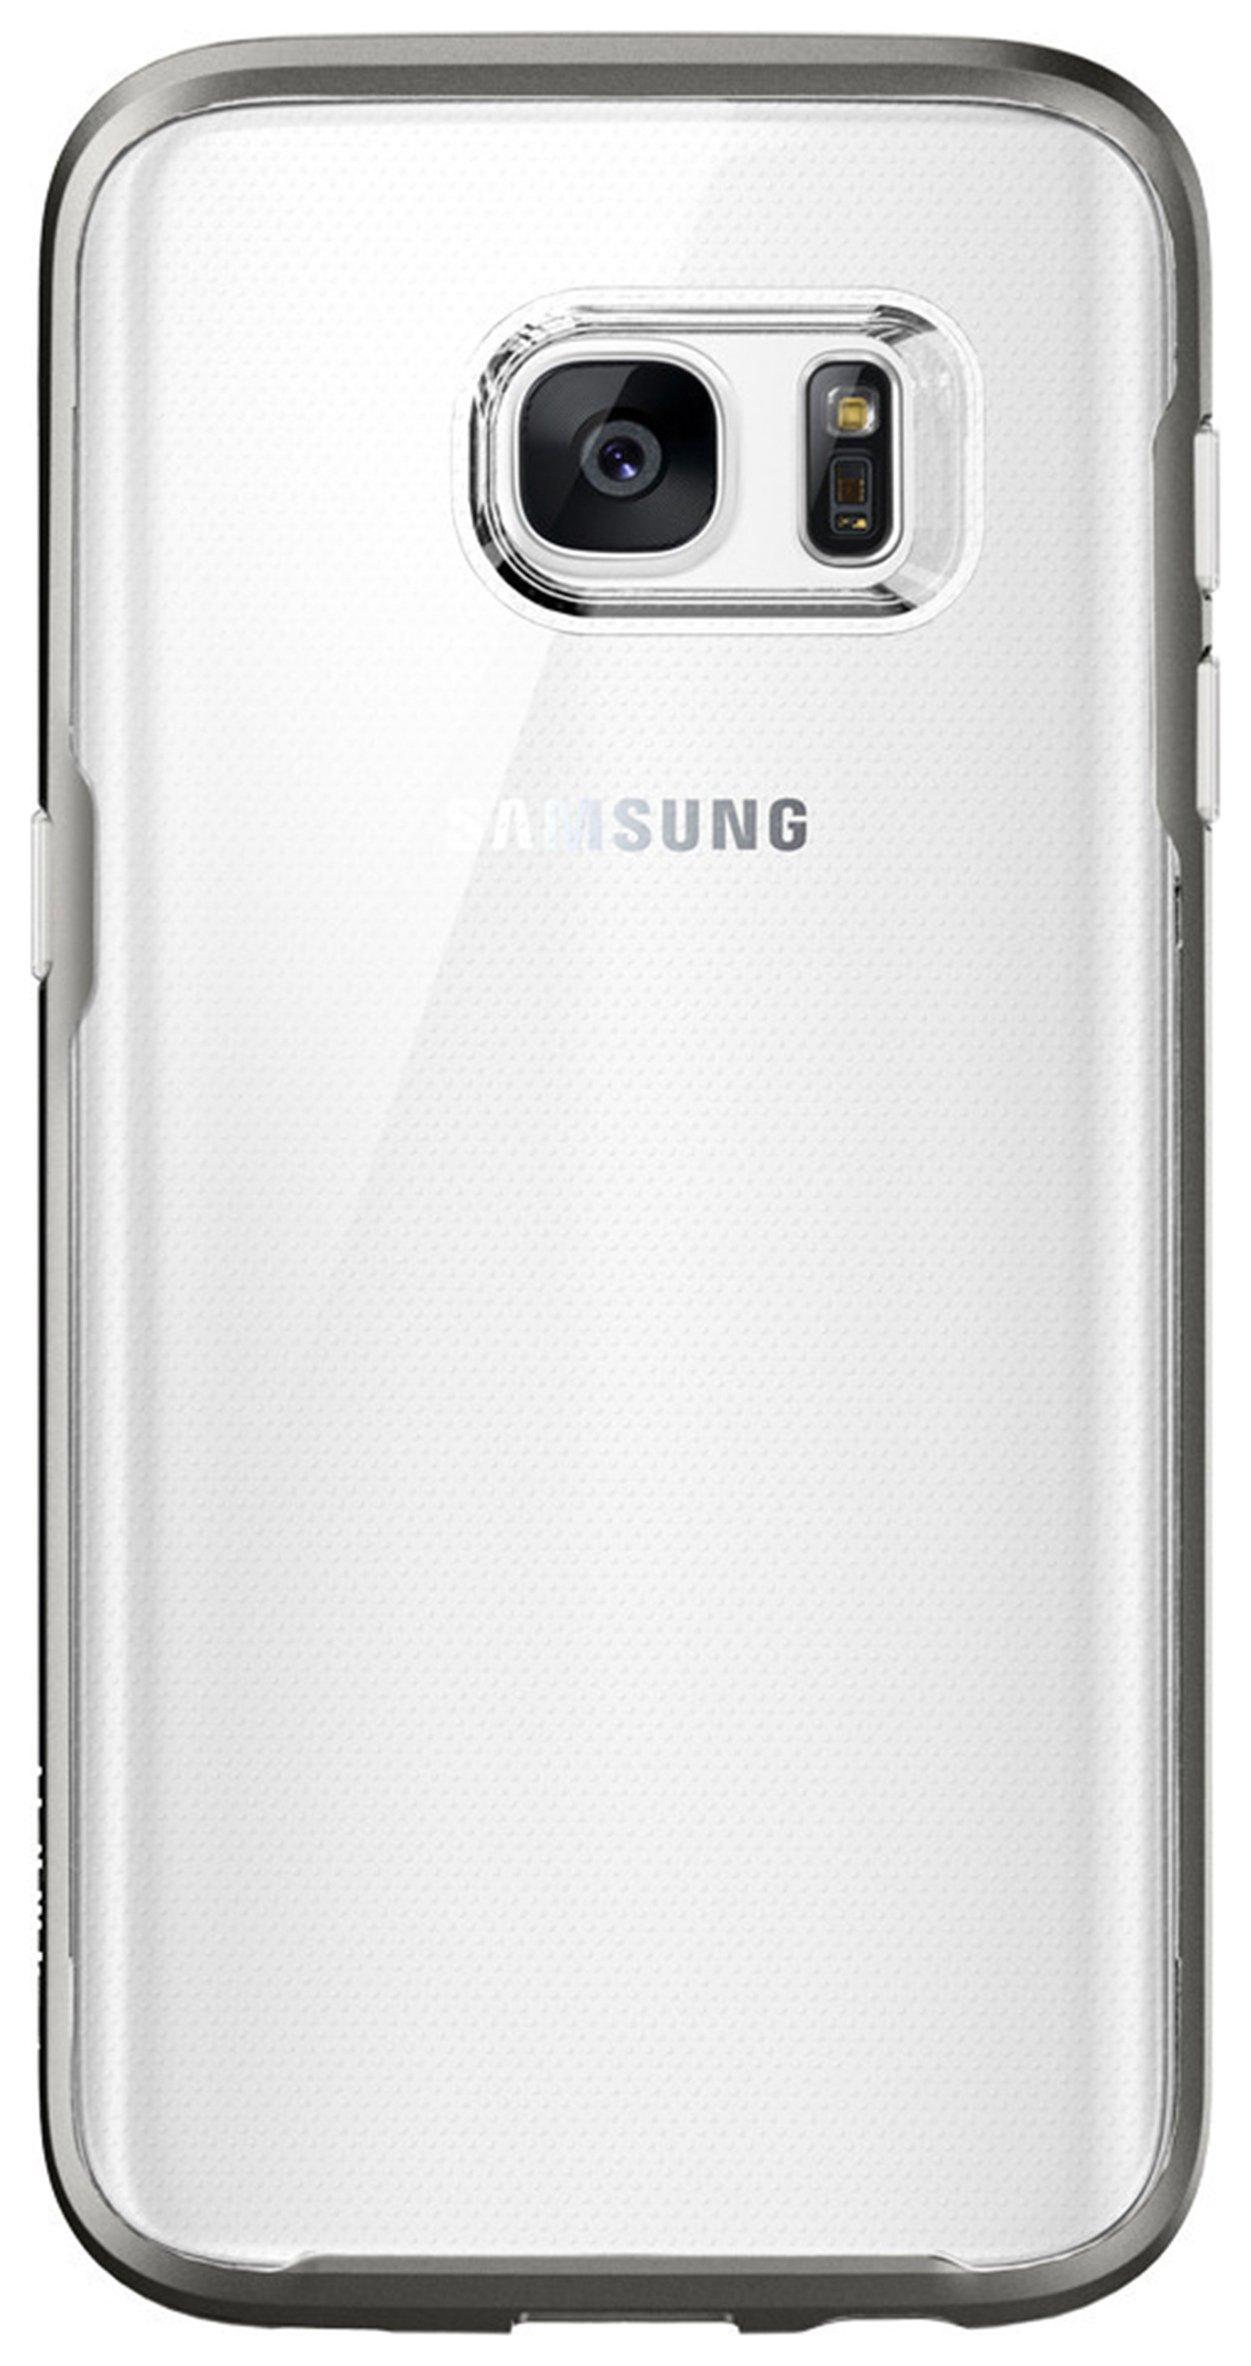 Spigen Hybrid Crystal Case for Galaxy S7 - Gun Metal.